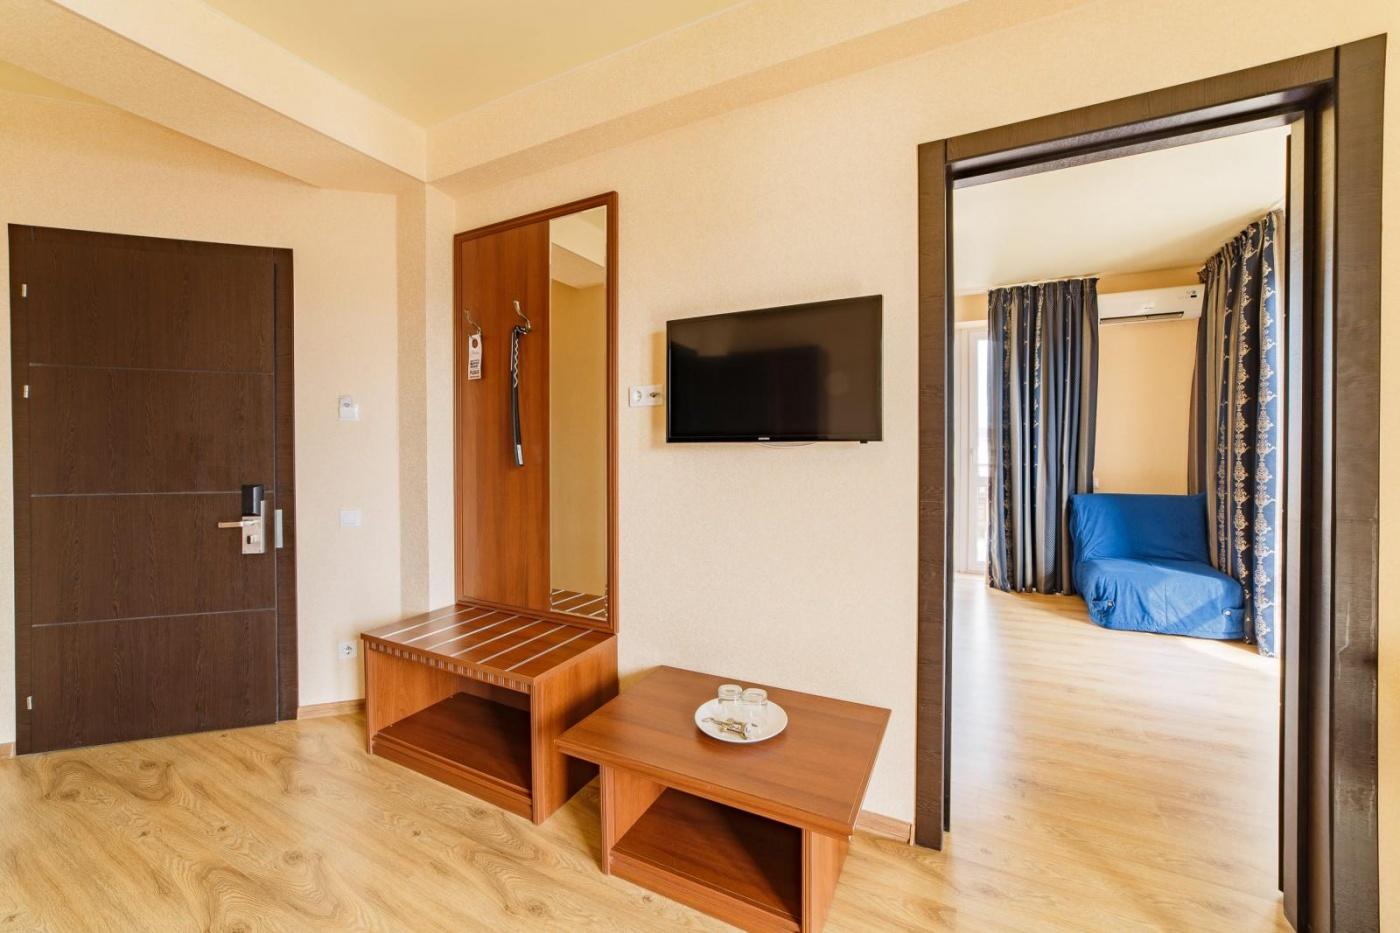 Отель «Relax» Краснодарский край Lux 2-комнатный, фото 6